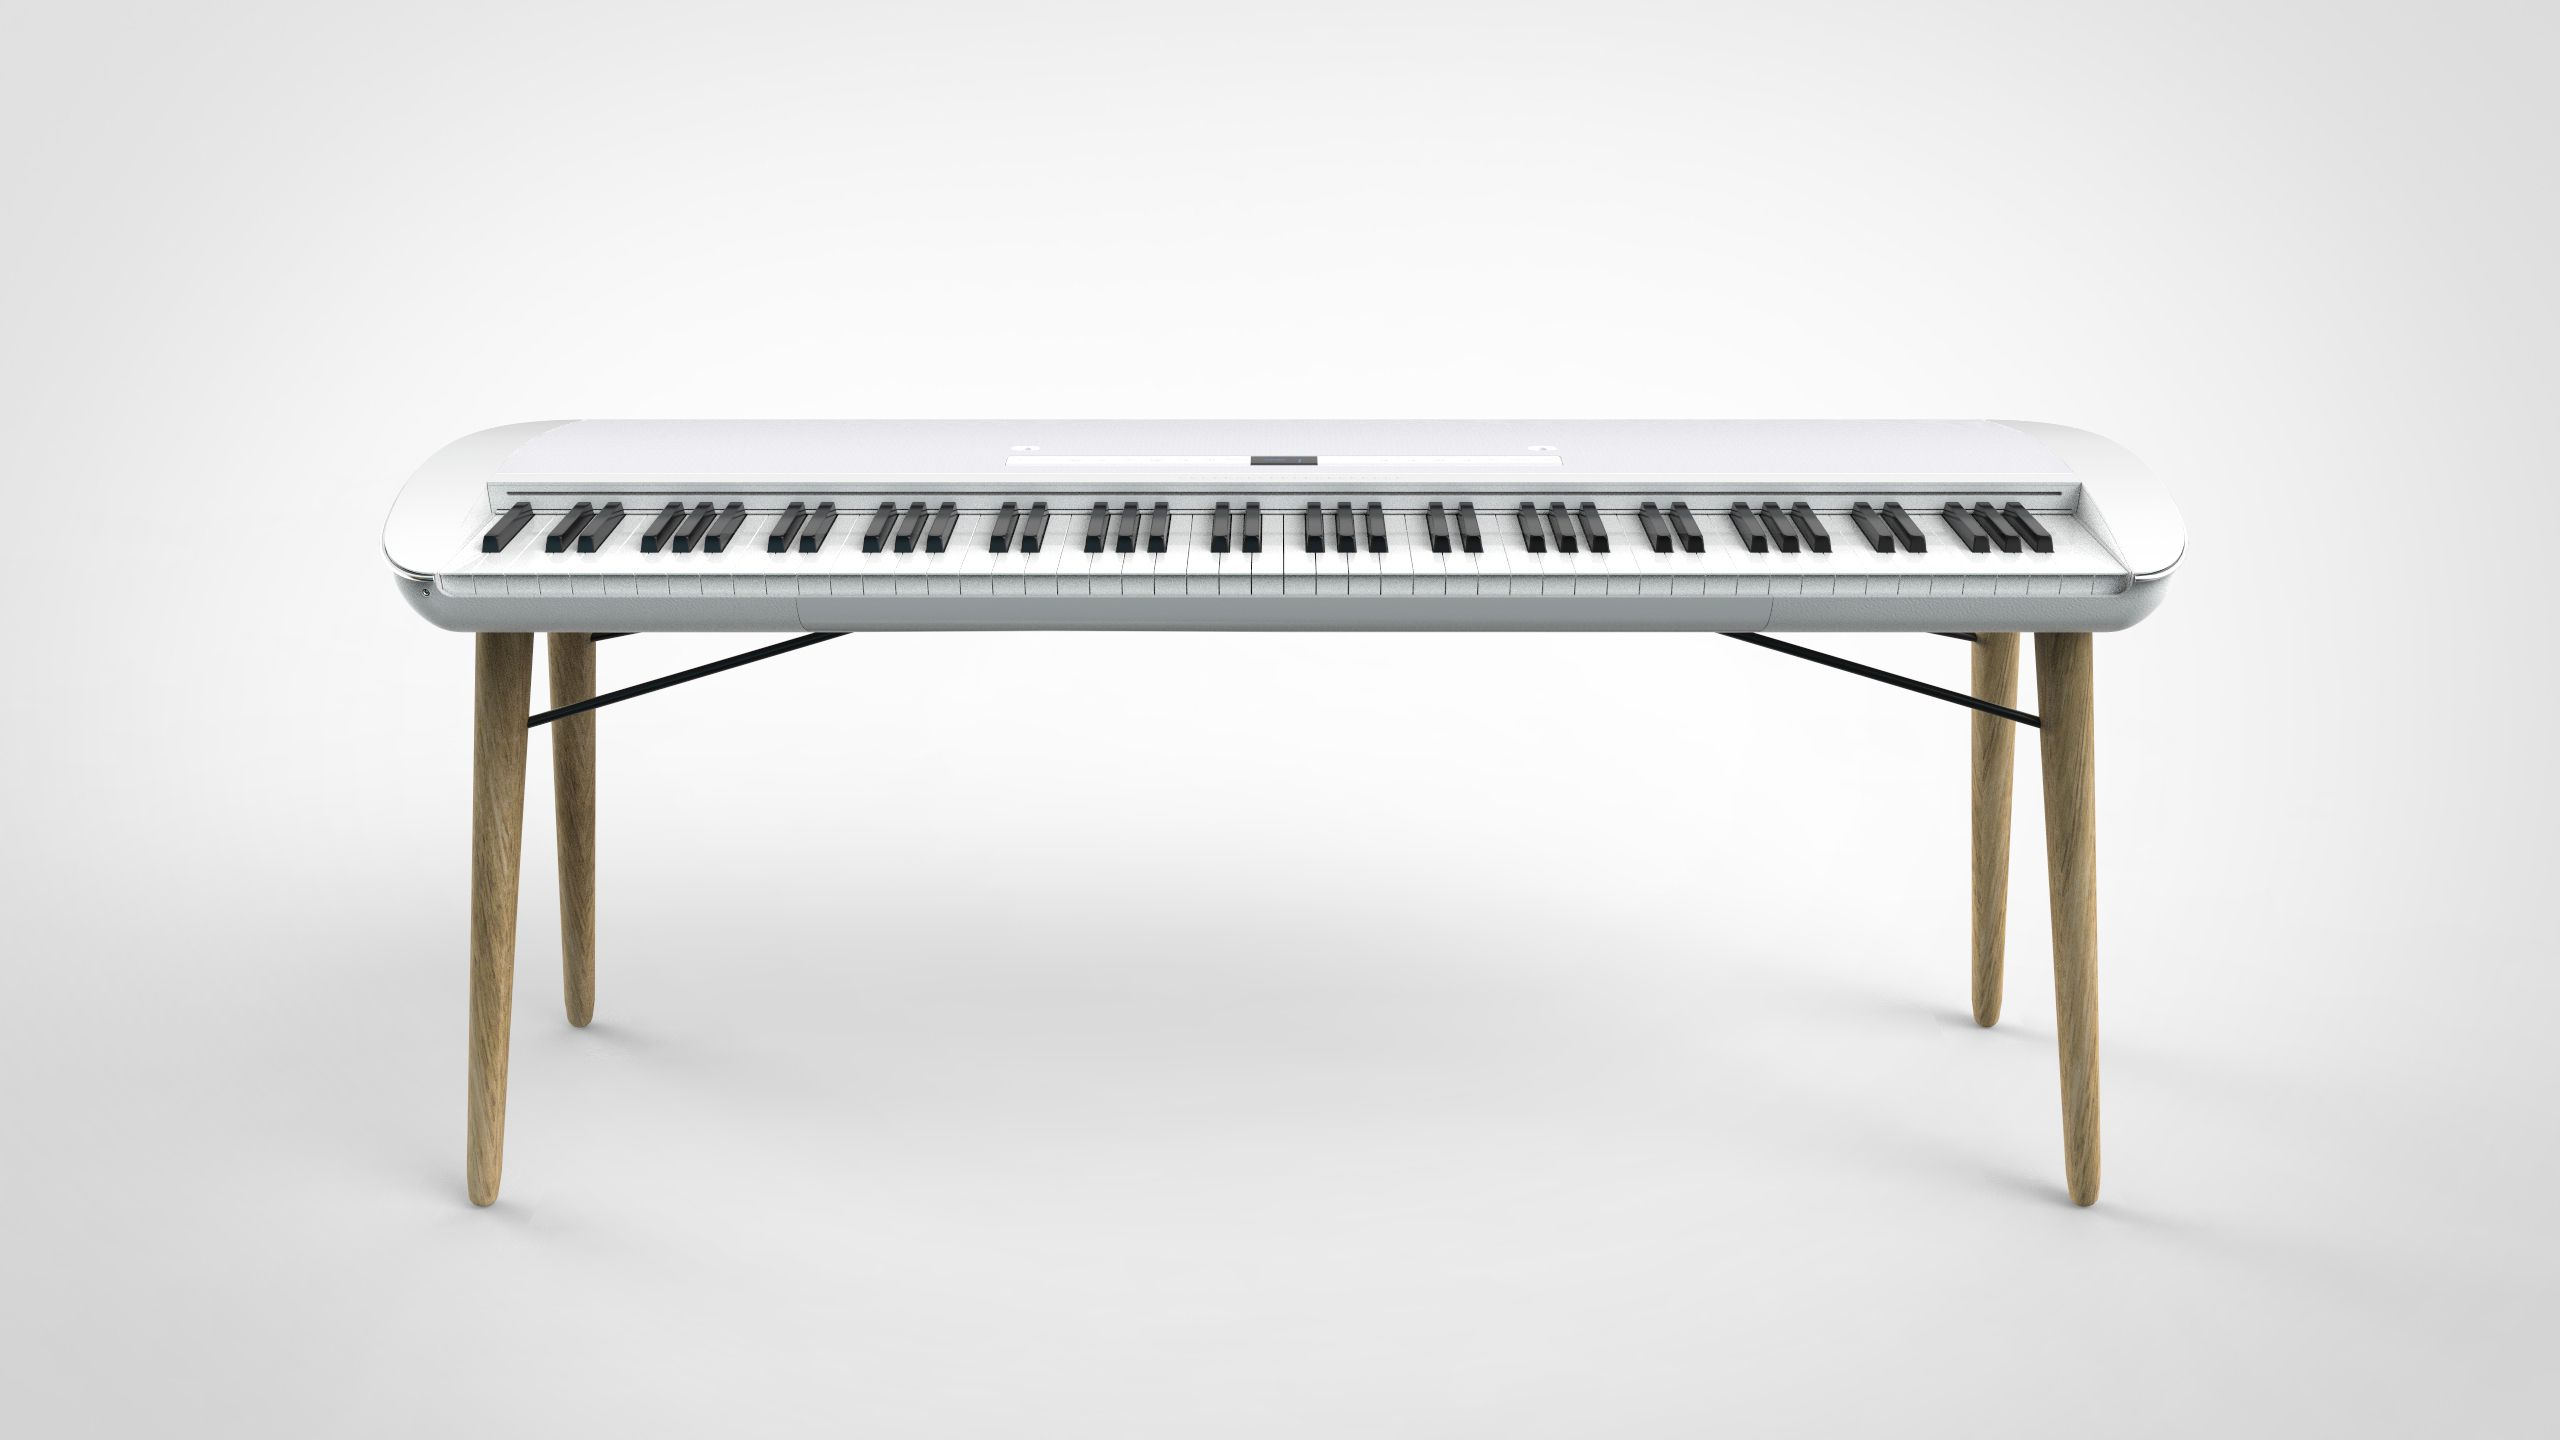 Beopiano - A digital piano for B&O